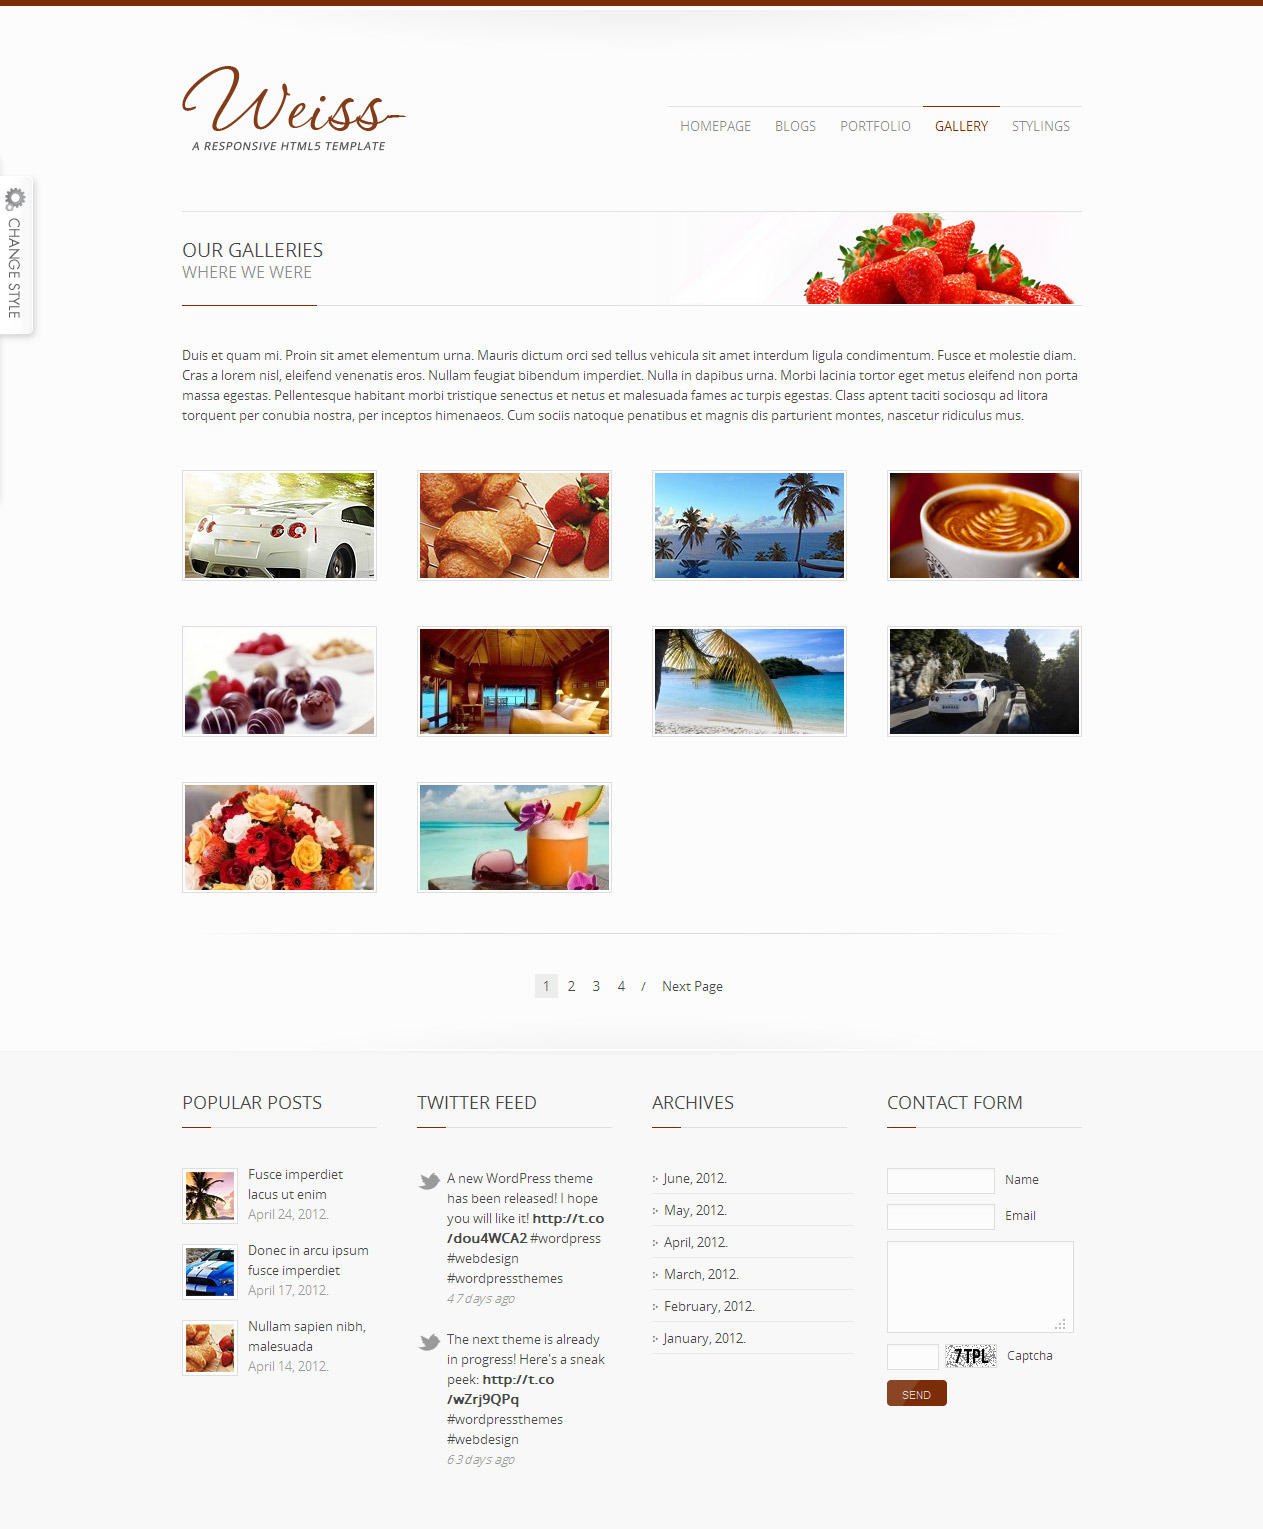 Weiss - Responsive HTML5 Template